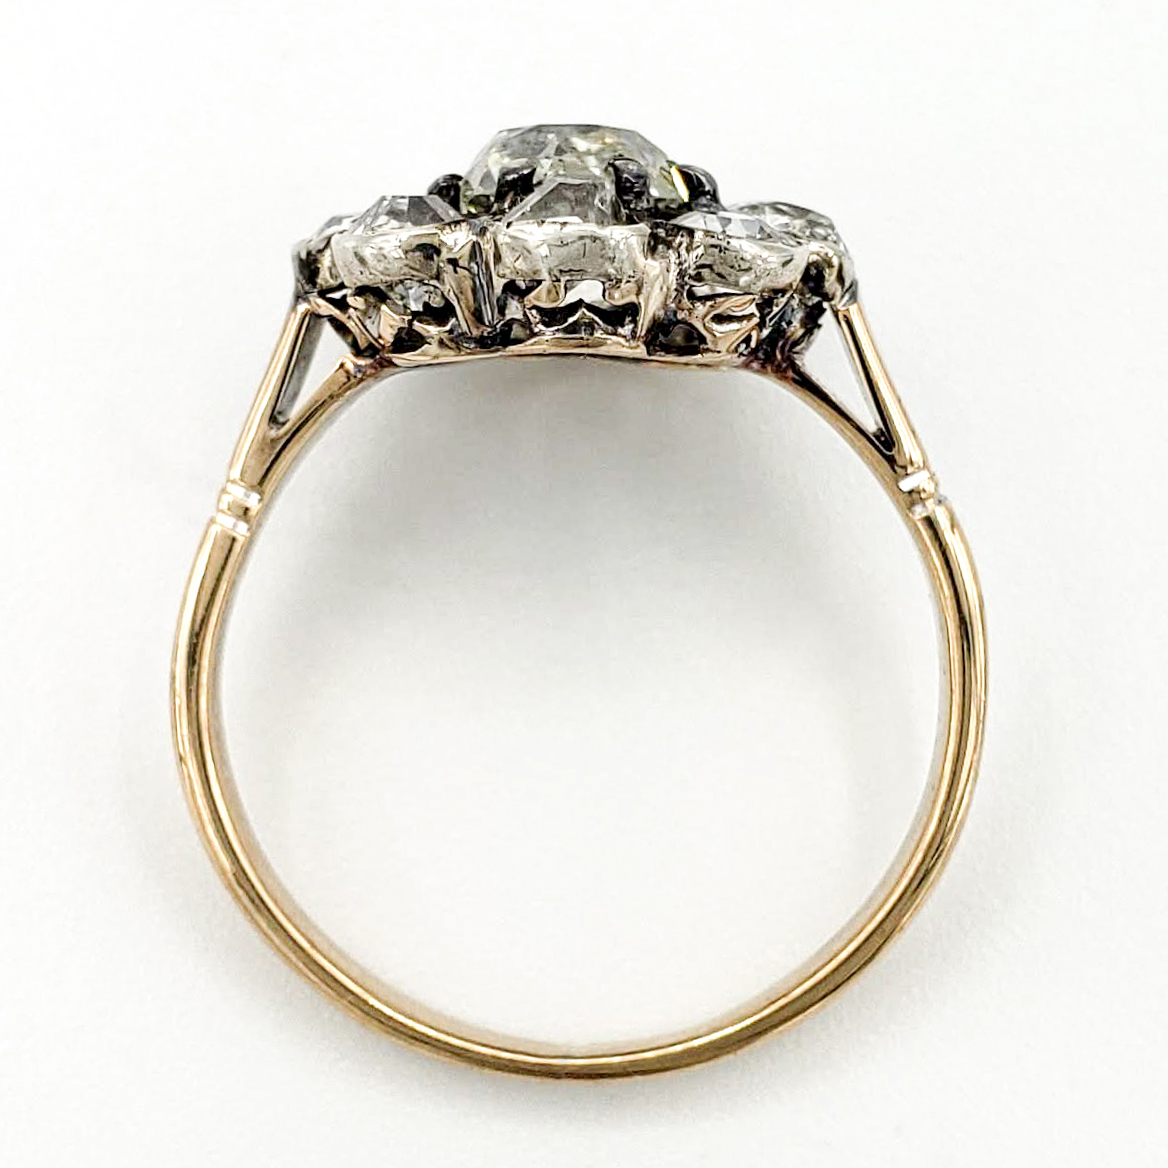 vintage-18-karat-engagement-ring-with-0-99-carat-old-mine-cut-diamond-egl-h-si2